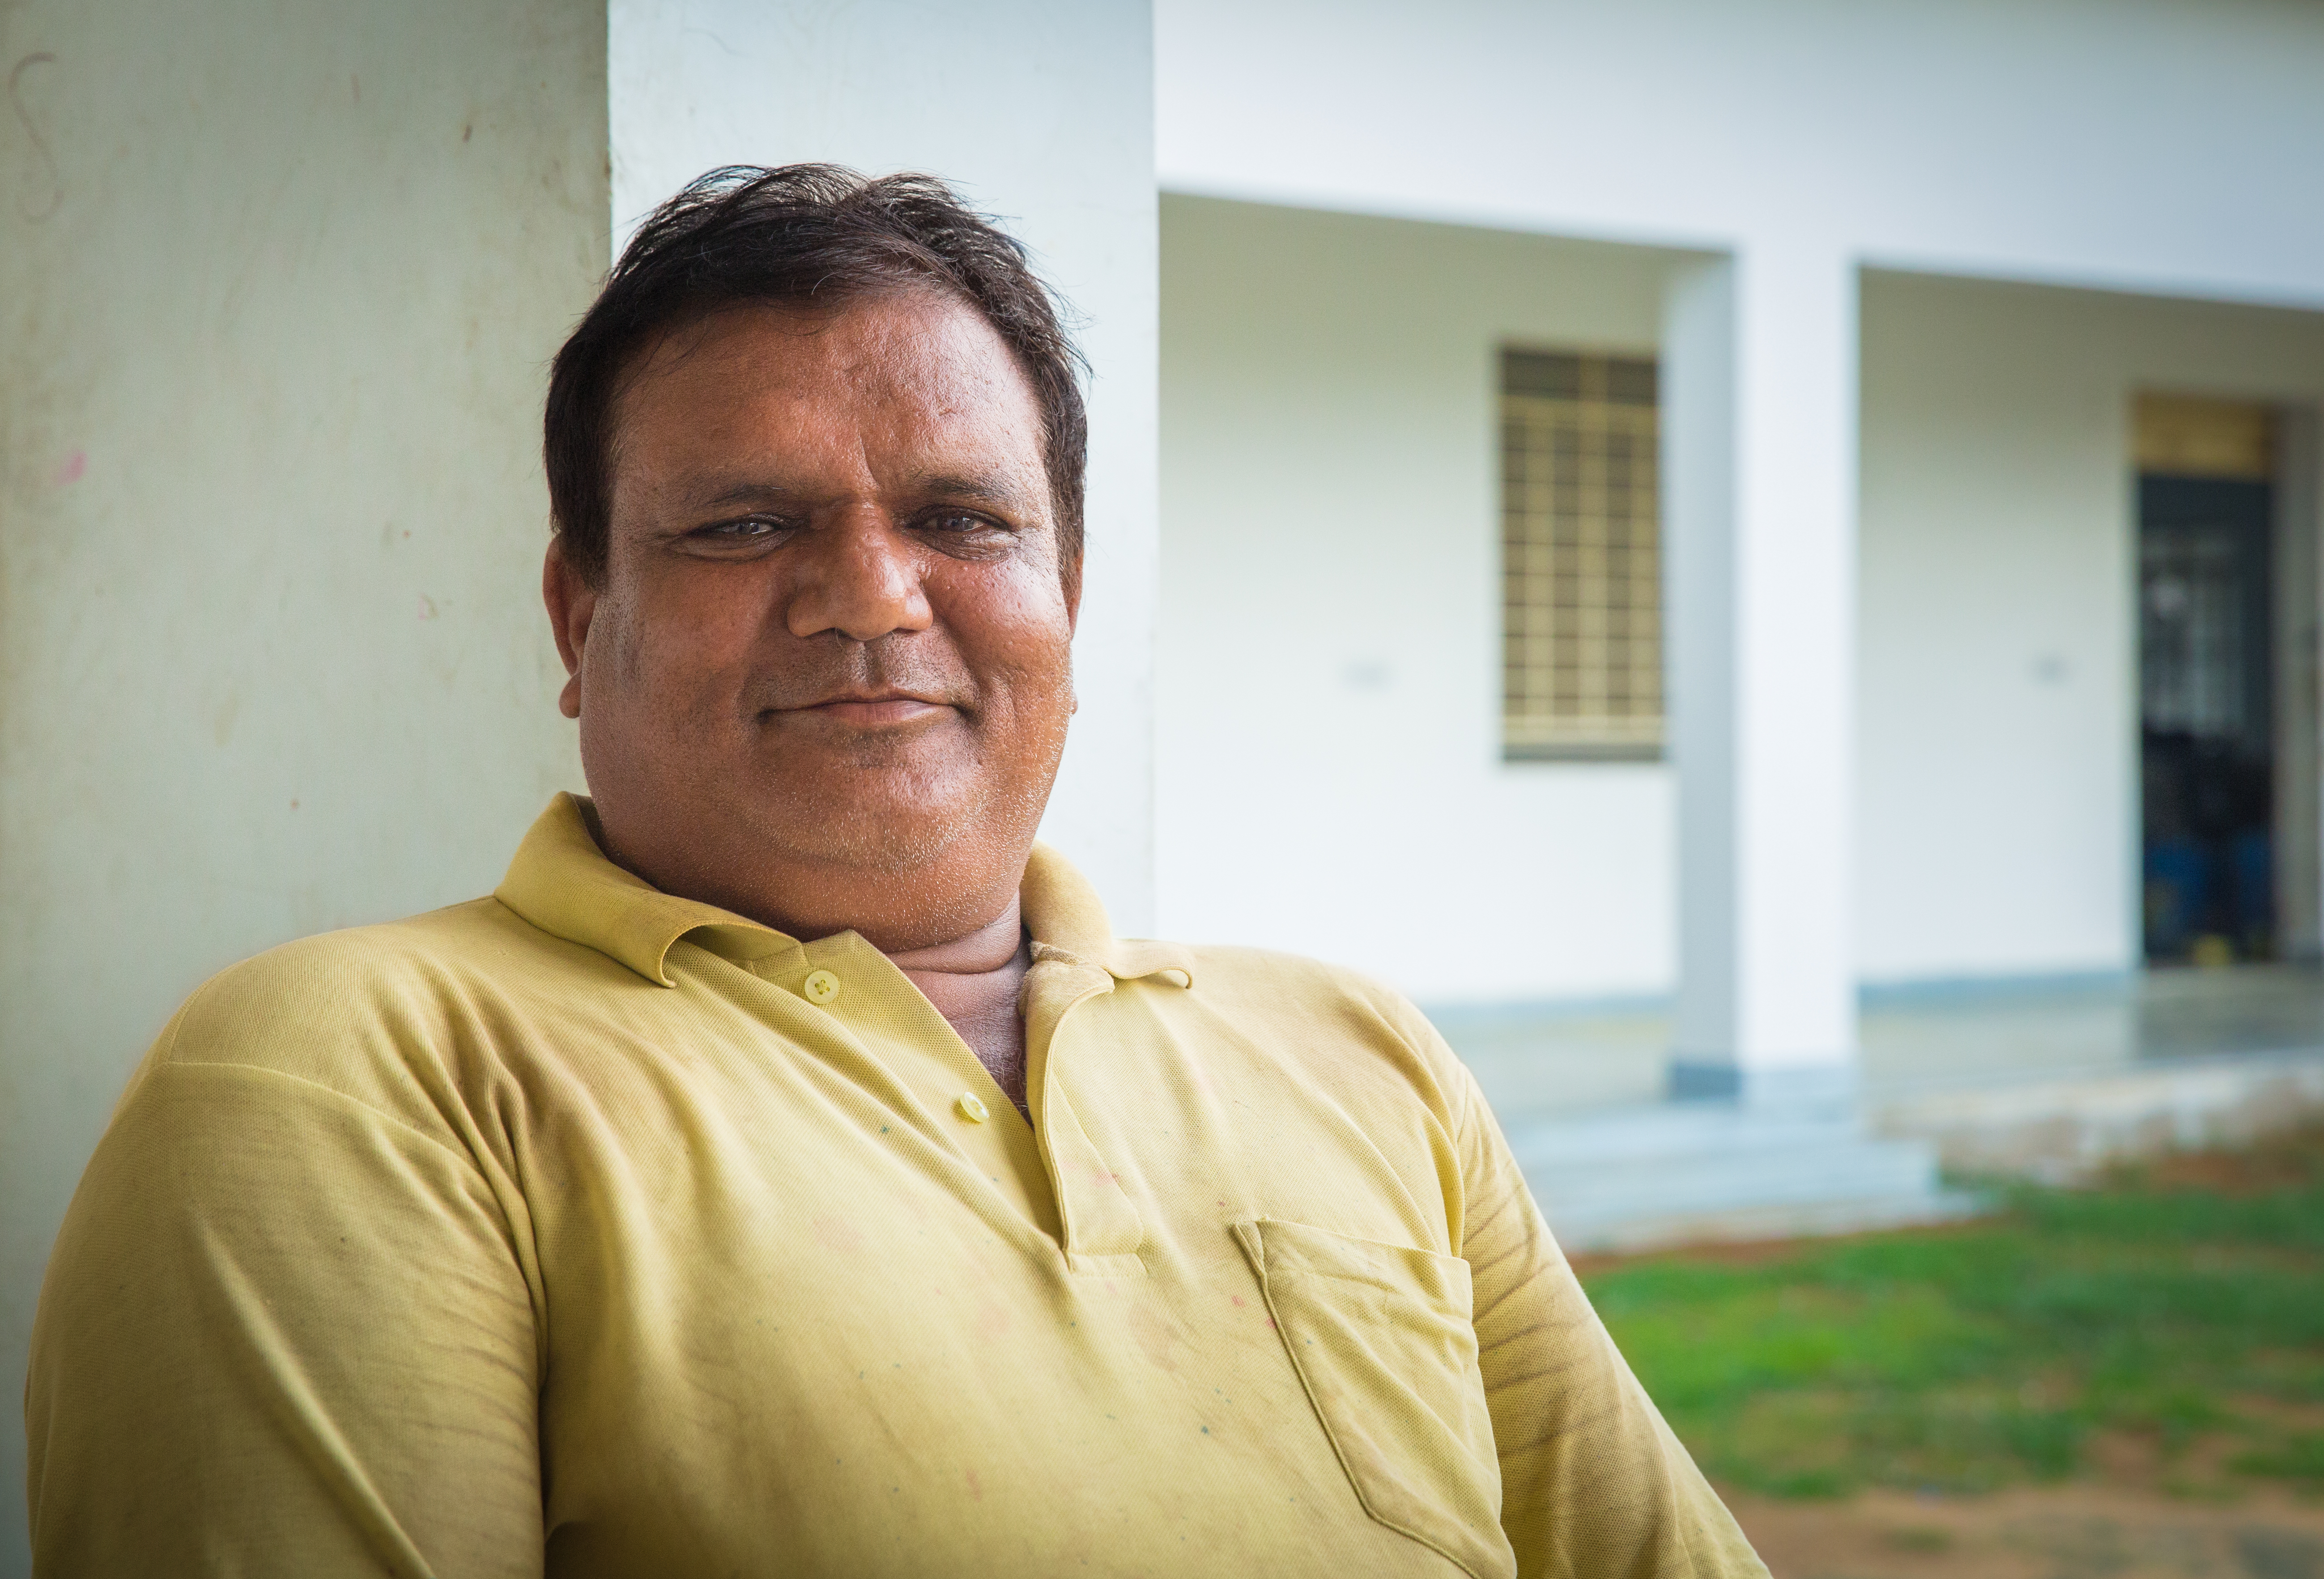 Lal Chand Derawala